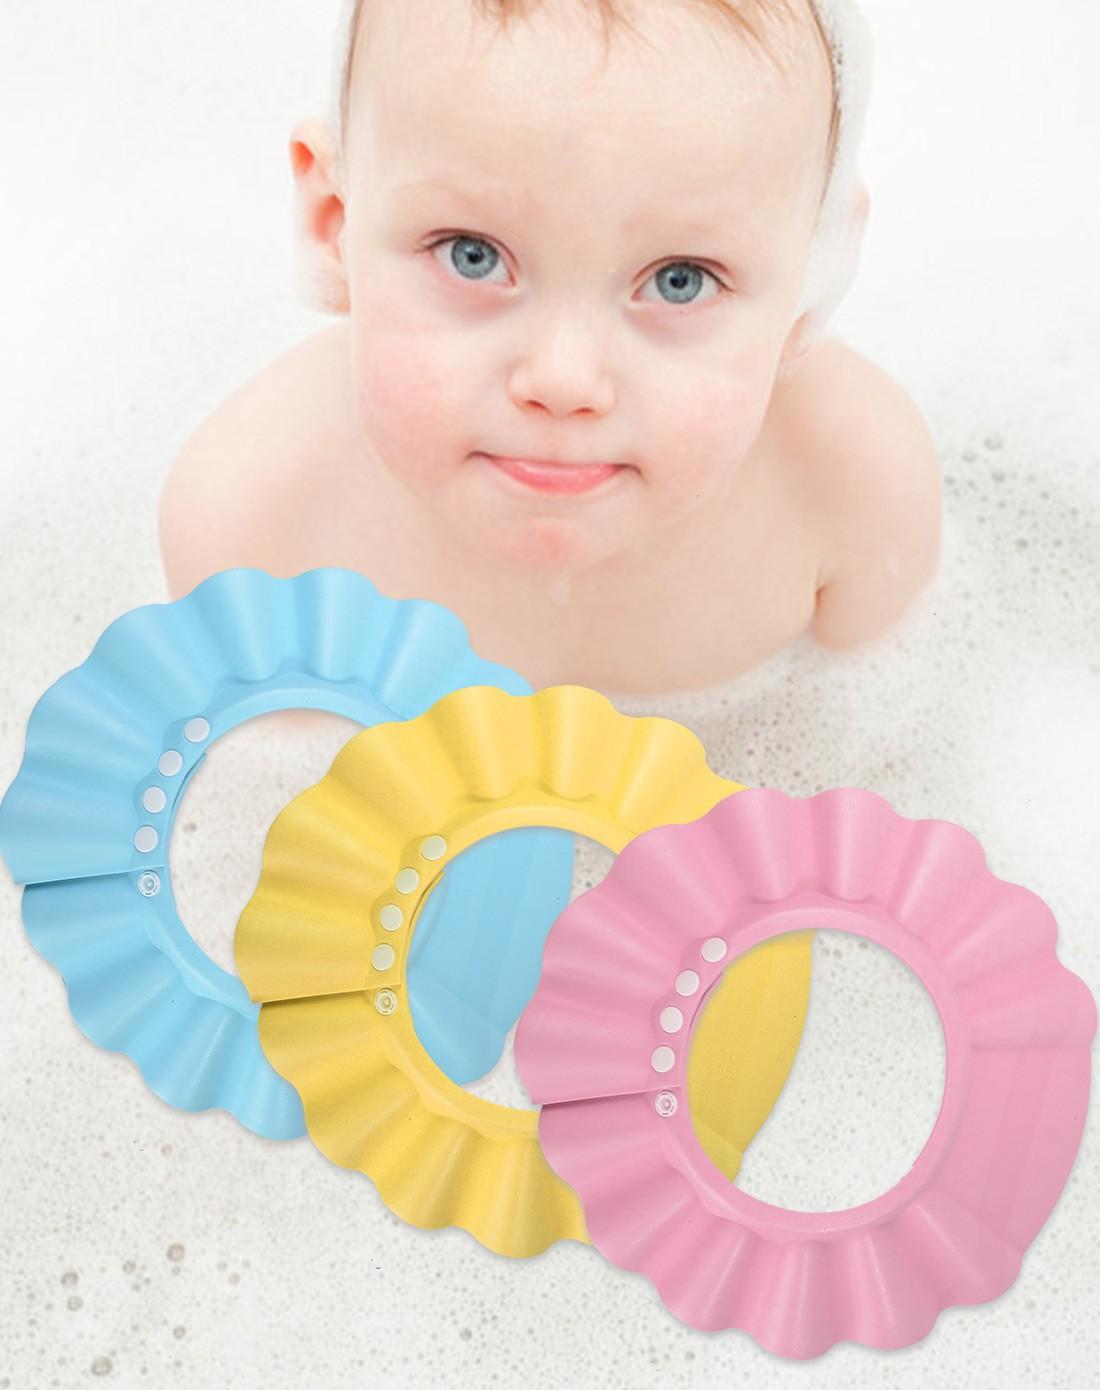 jm韩式优质多用途婴儿浴帽(混色)